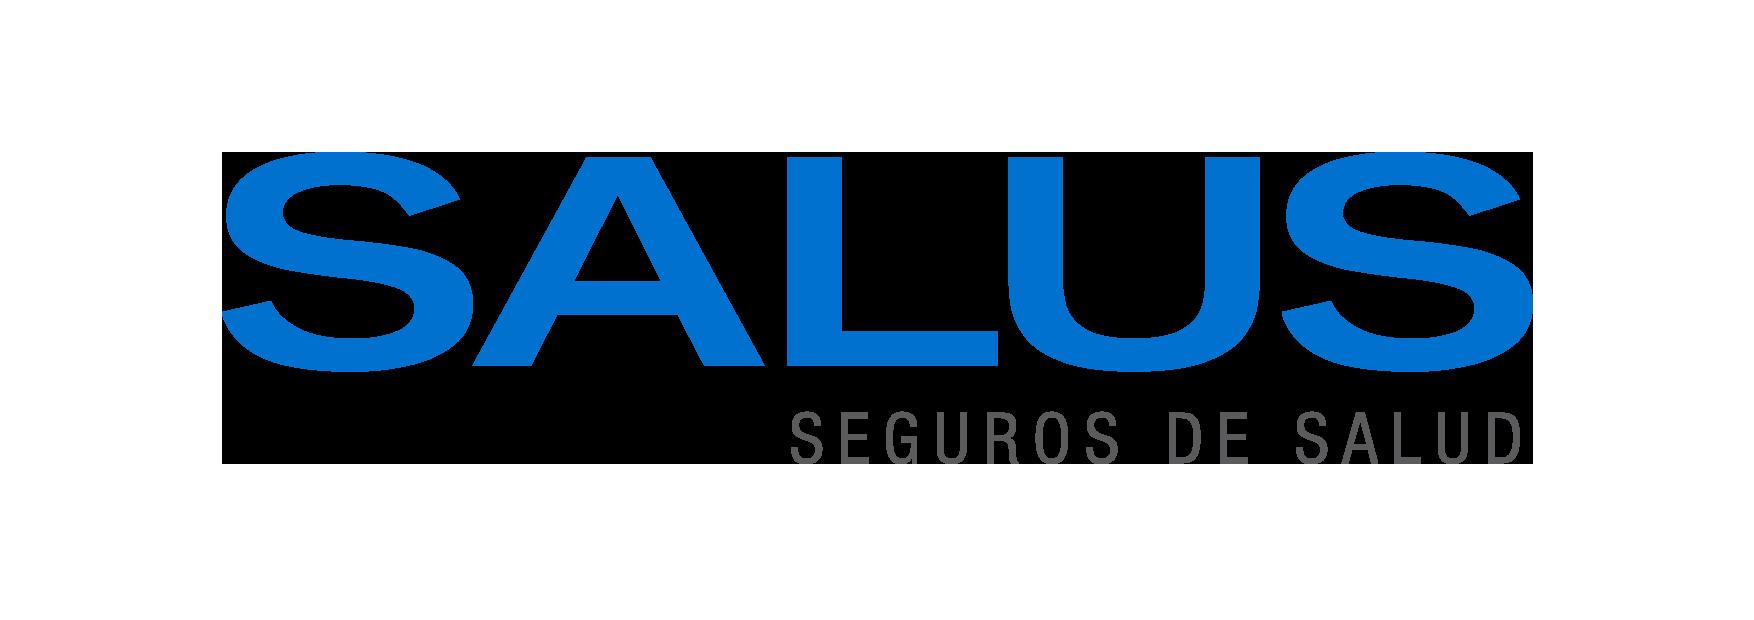 logos_salus_idiomas_espanol